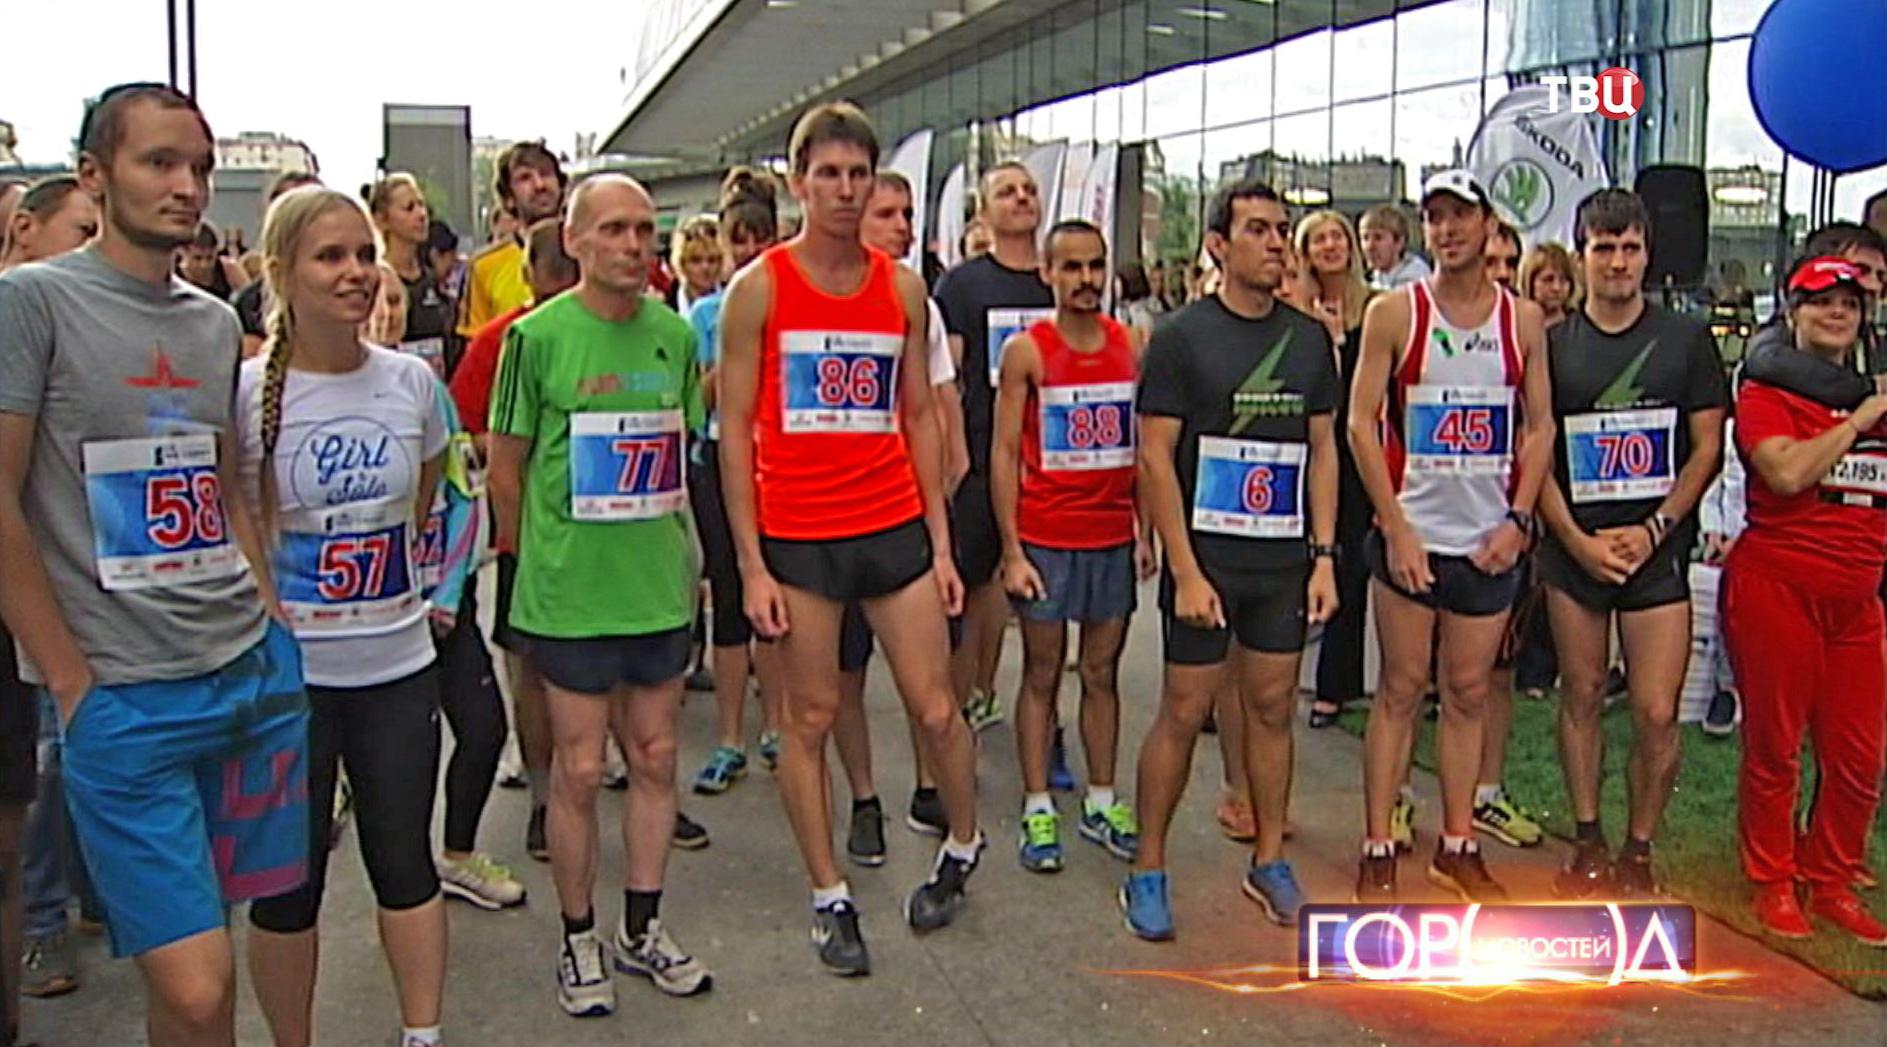 Участники забега на старте